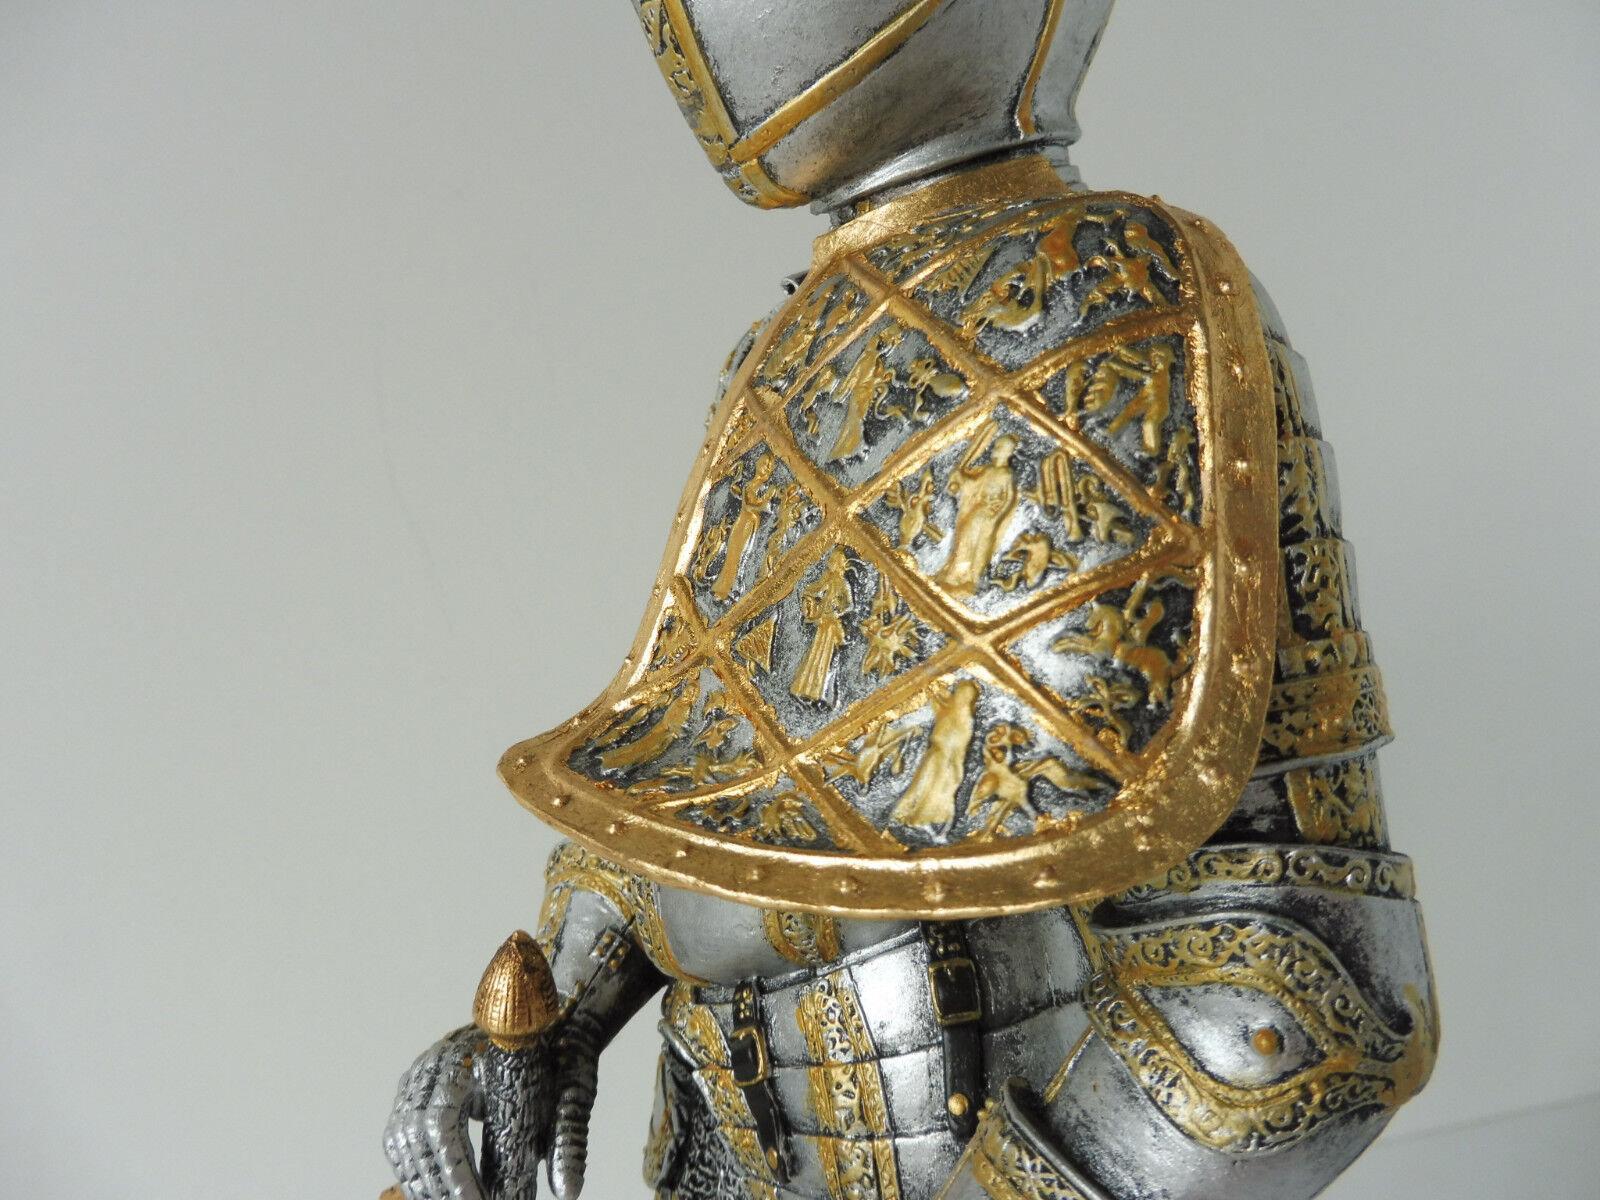 Figurina Cavaliere Cavaliere Cavaliere Pfeffenhauser Augsburghistorical Knights Veronese MC807 45a2f8